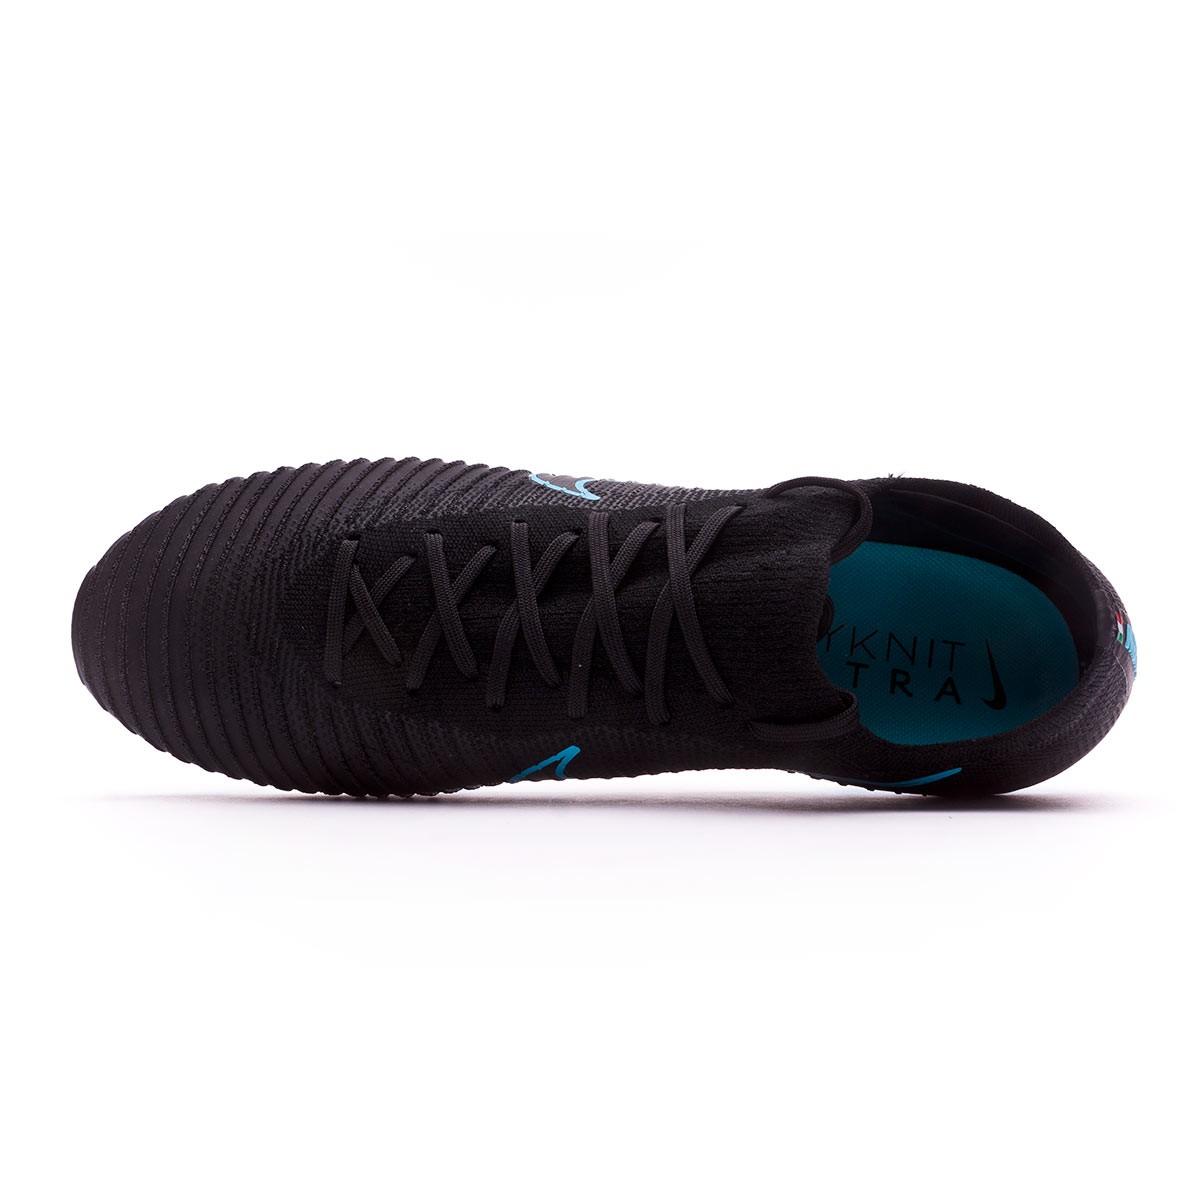 9d40dc43906 Football Boots Nike Mercurial Vapor Flyknit Ultra FG Black-Gamma blue -  Tienda de fútbol Fútbol Emotion